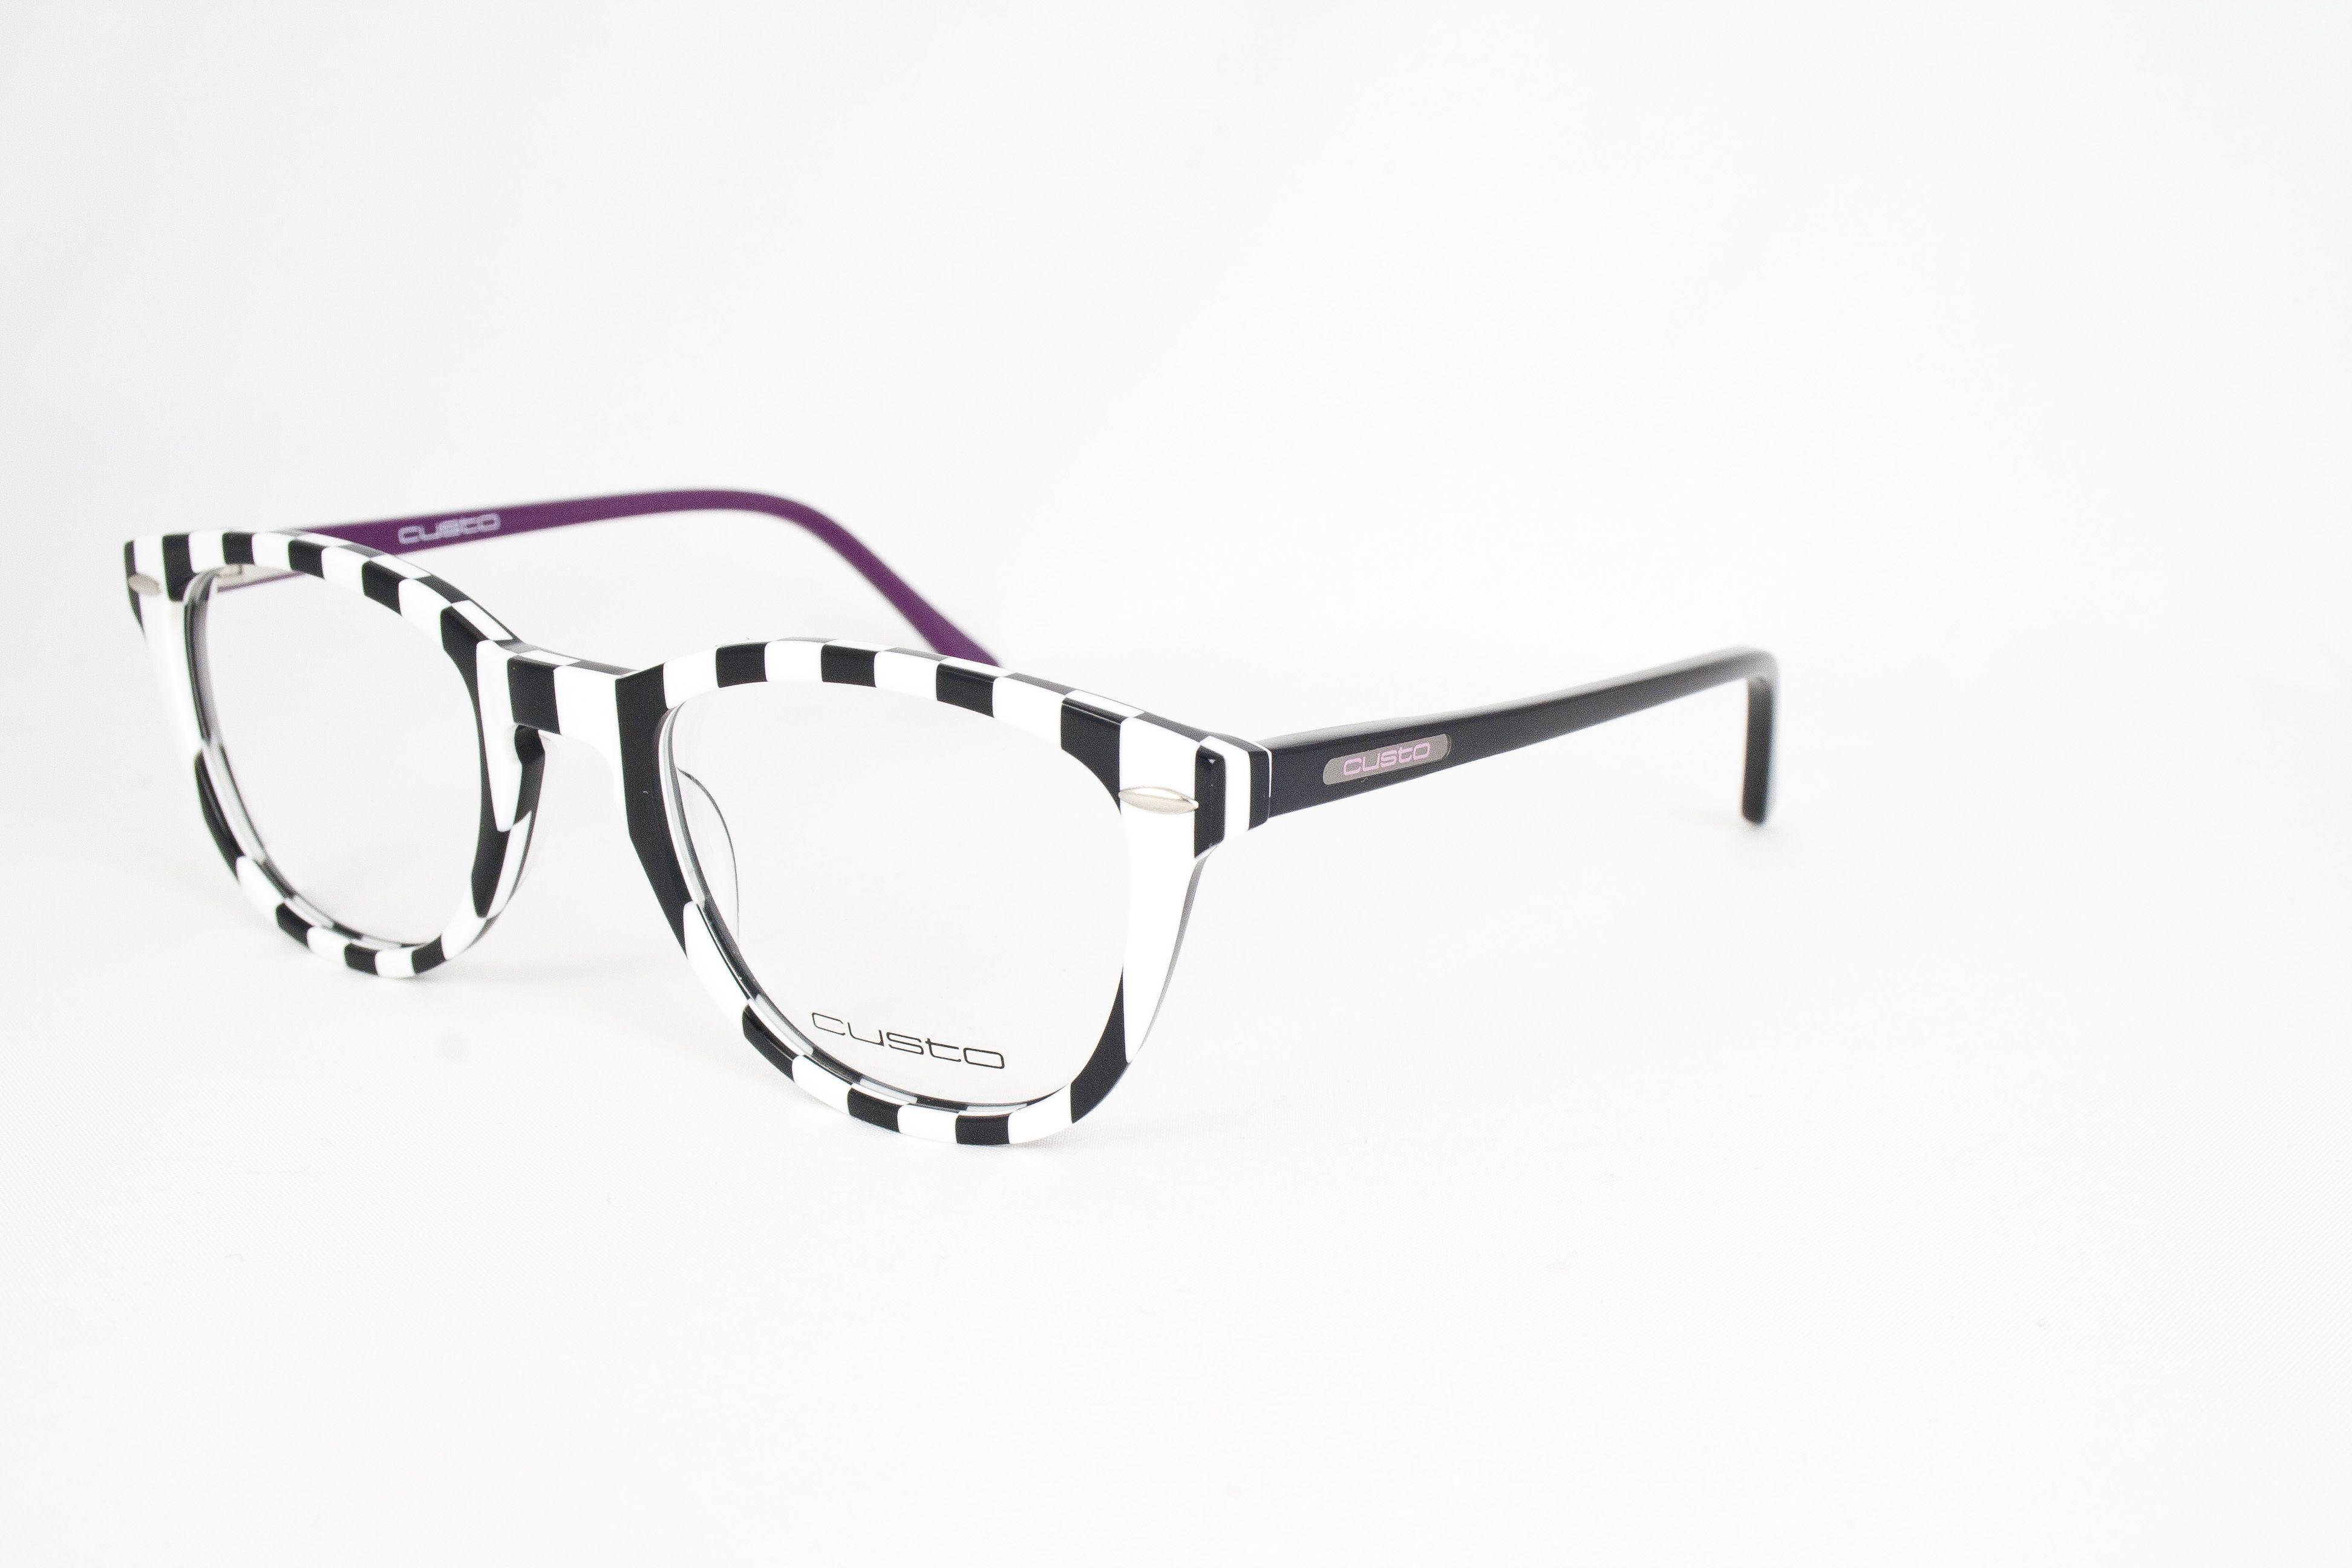 Gafas Custo Barcelona para Opticalia.